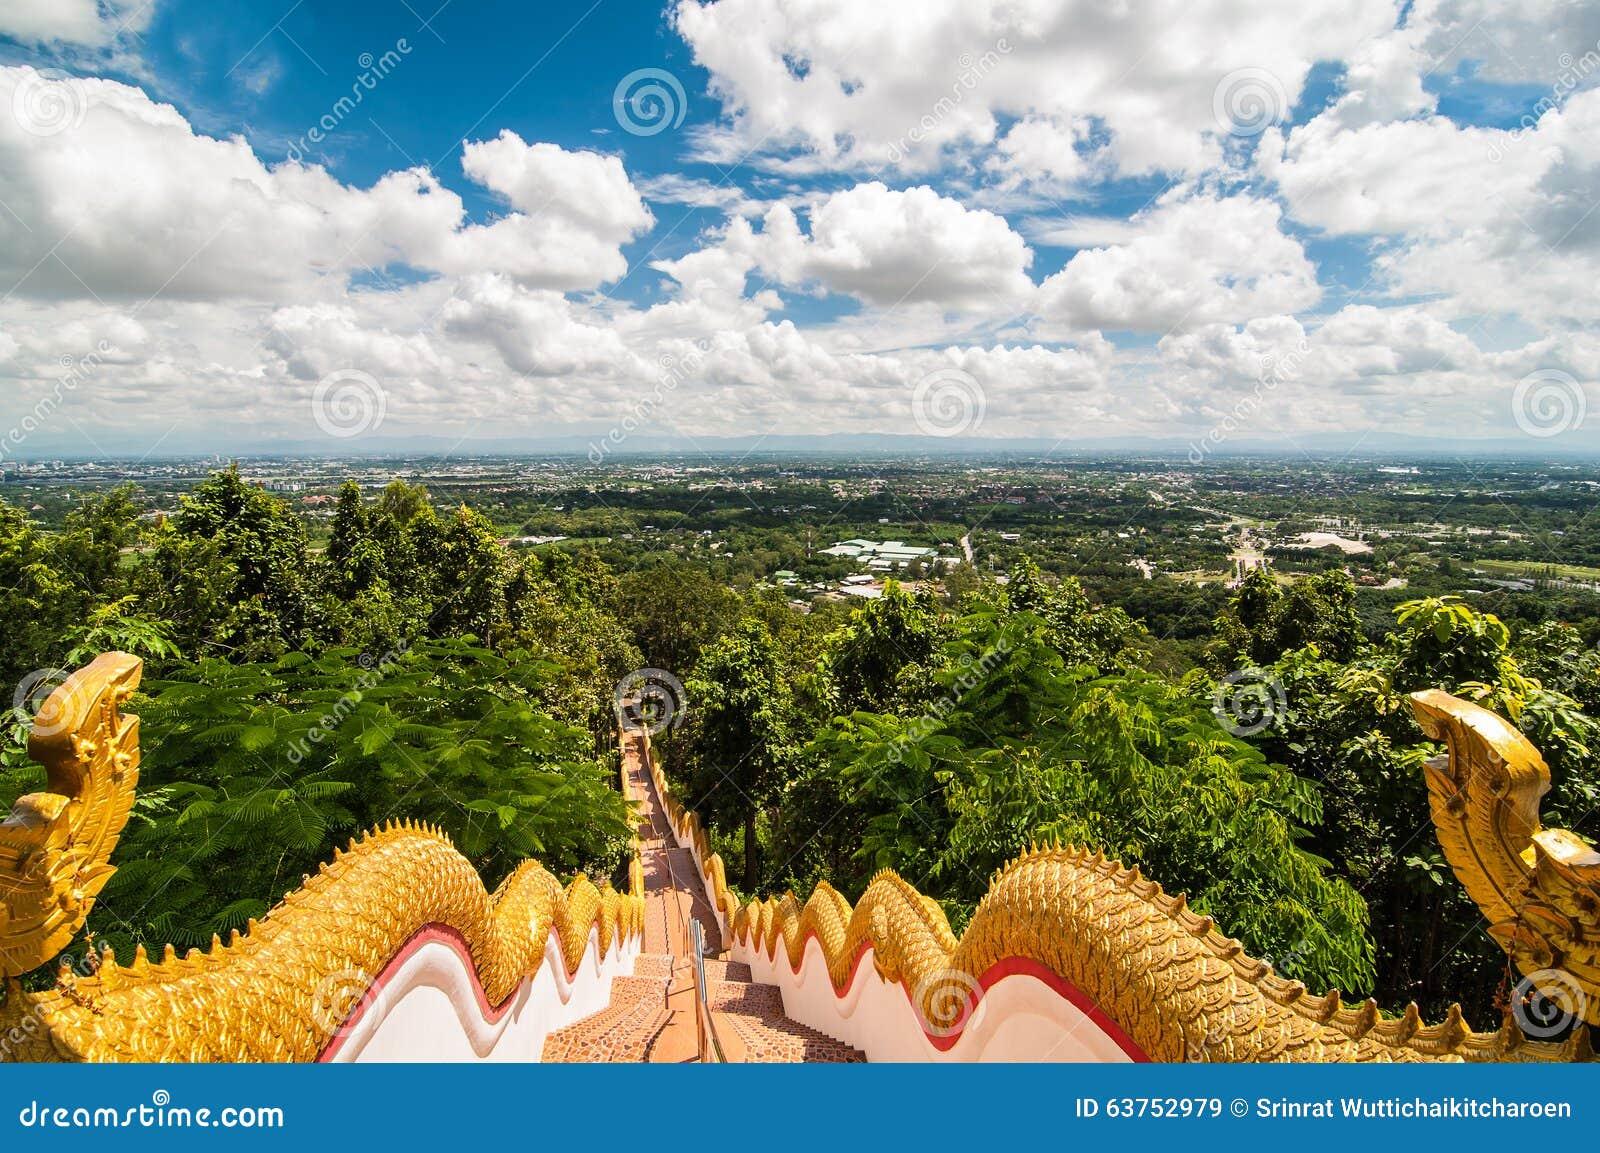 tempeltreppe mit chiang mai stadt thailand landschaft stockbild bild von wei landschaft. Black Bedroom Furniture Sets. Home Design Ideas